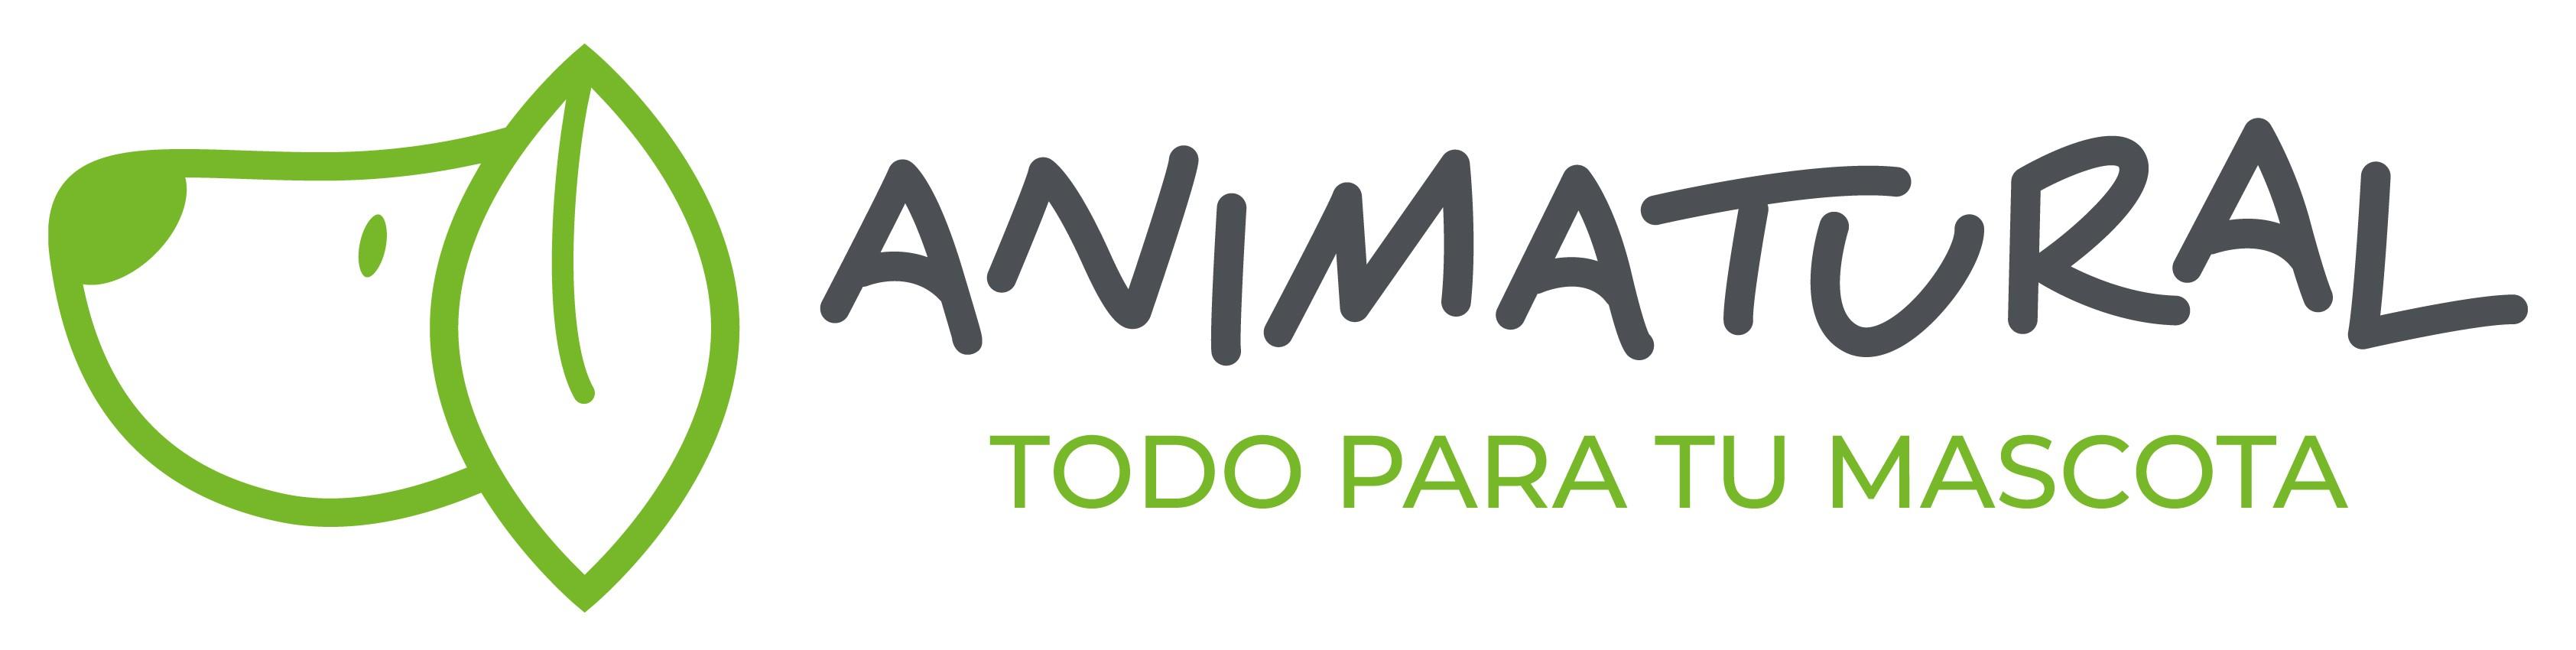 Animatural